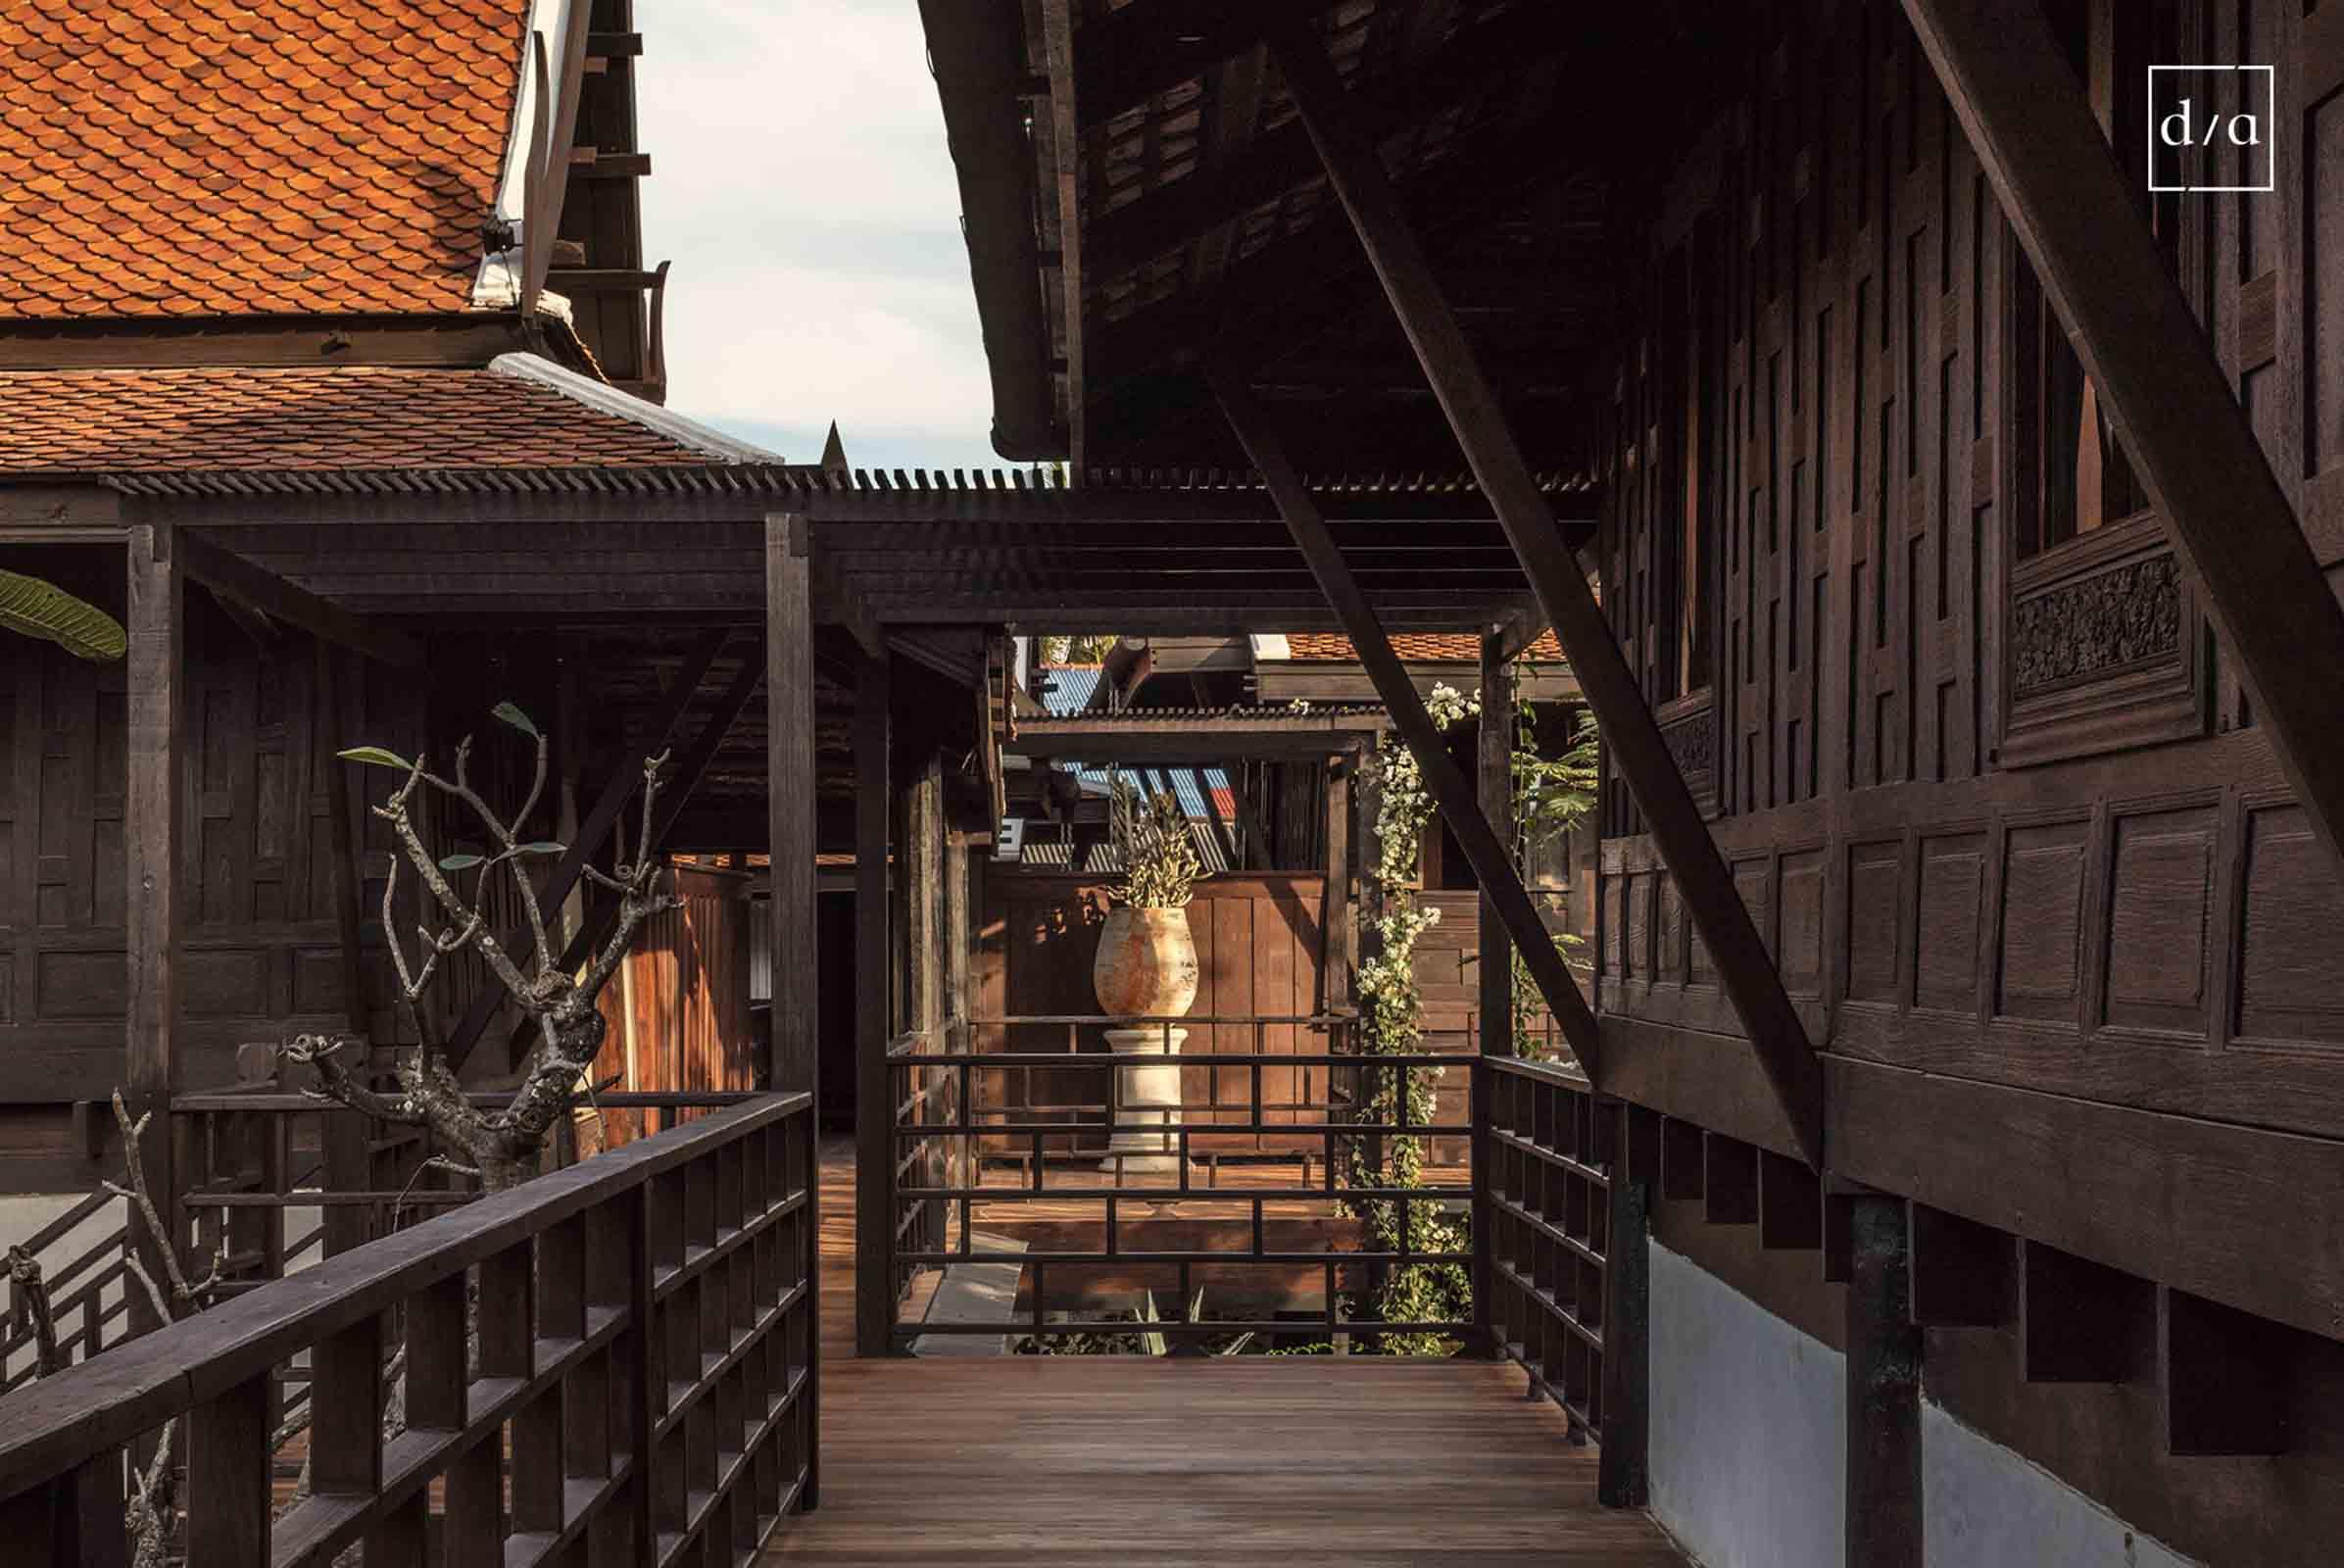 DA Thailand 4-77.jpg